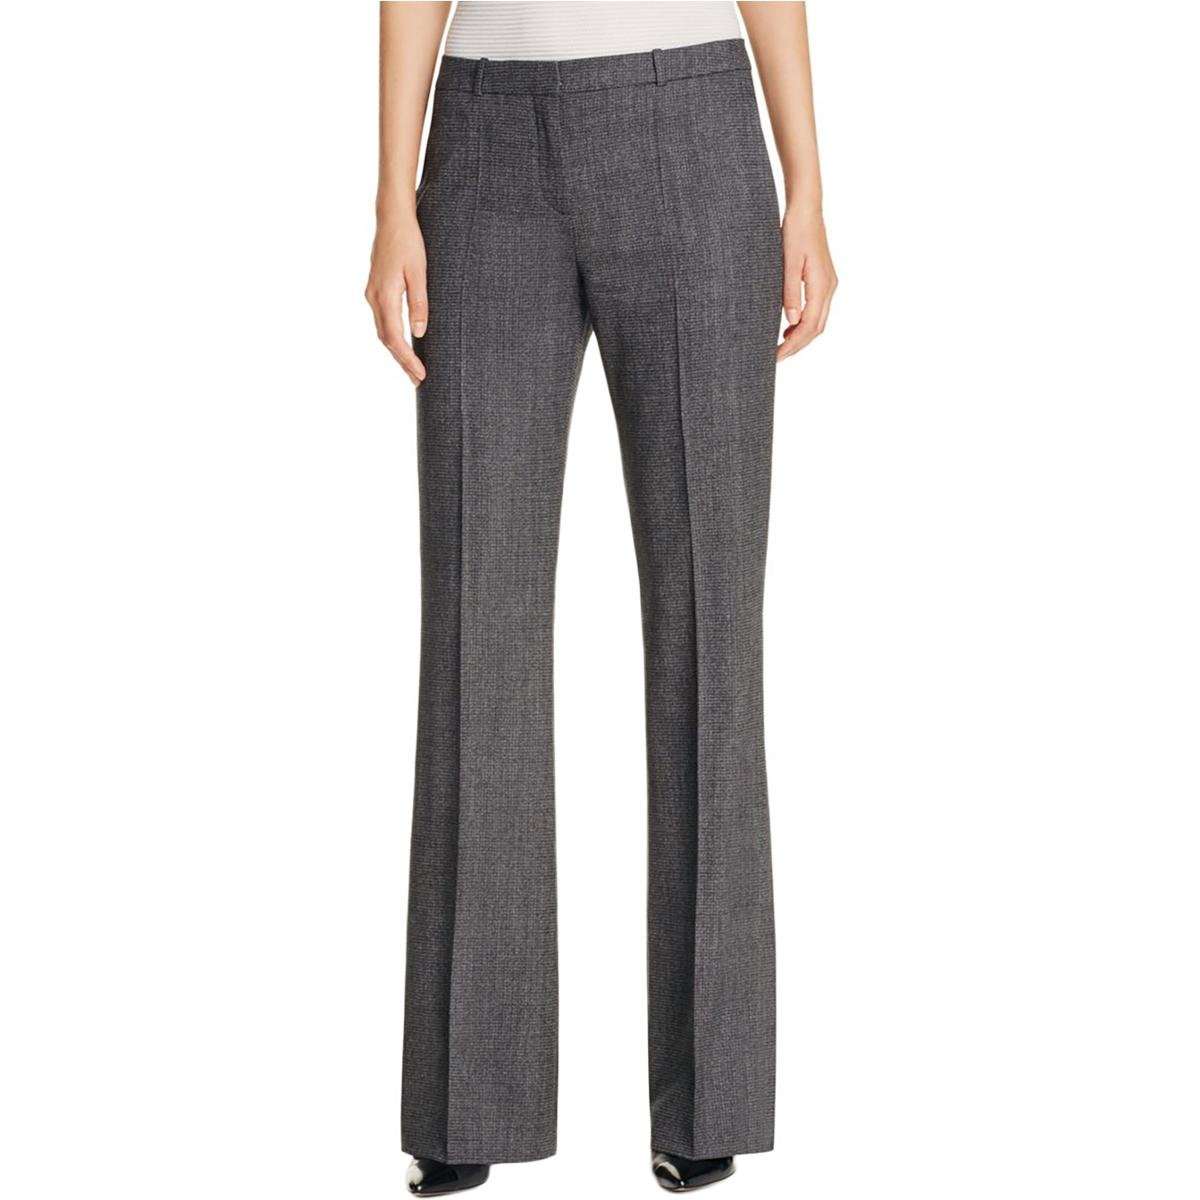 BOSS Hugo Boss Womens Tusini Virgin Wool Stretch Bootcut Pants Black 6 by Hugo Boss